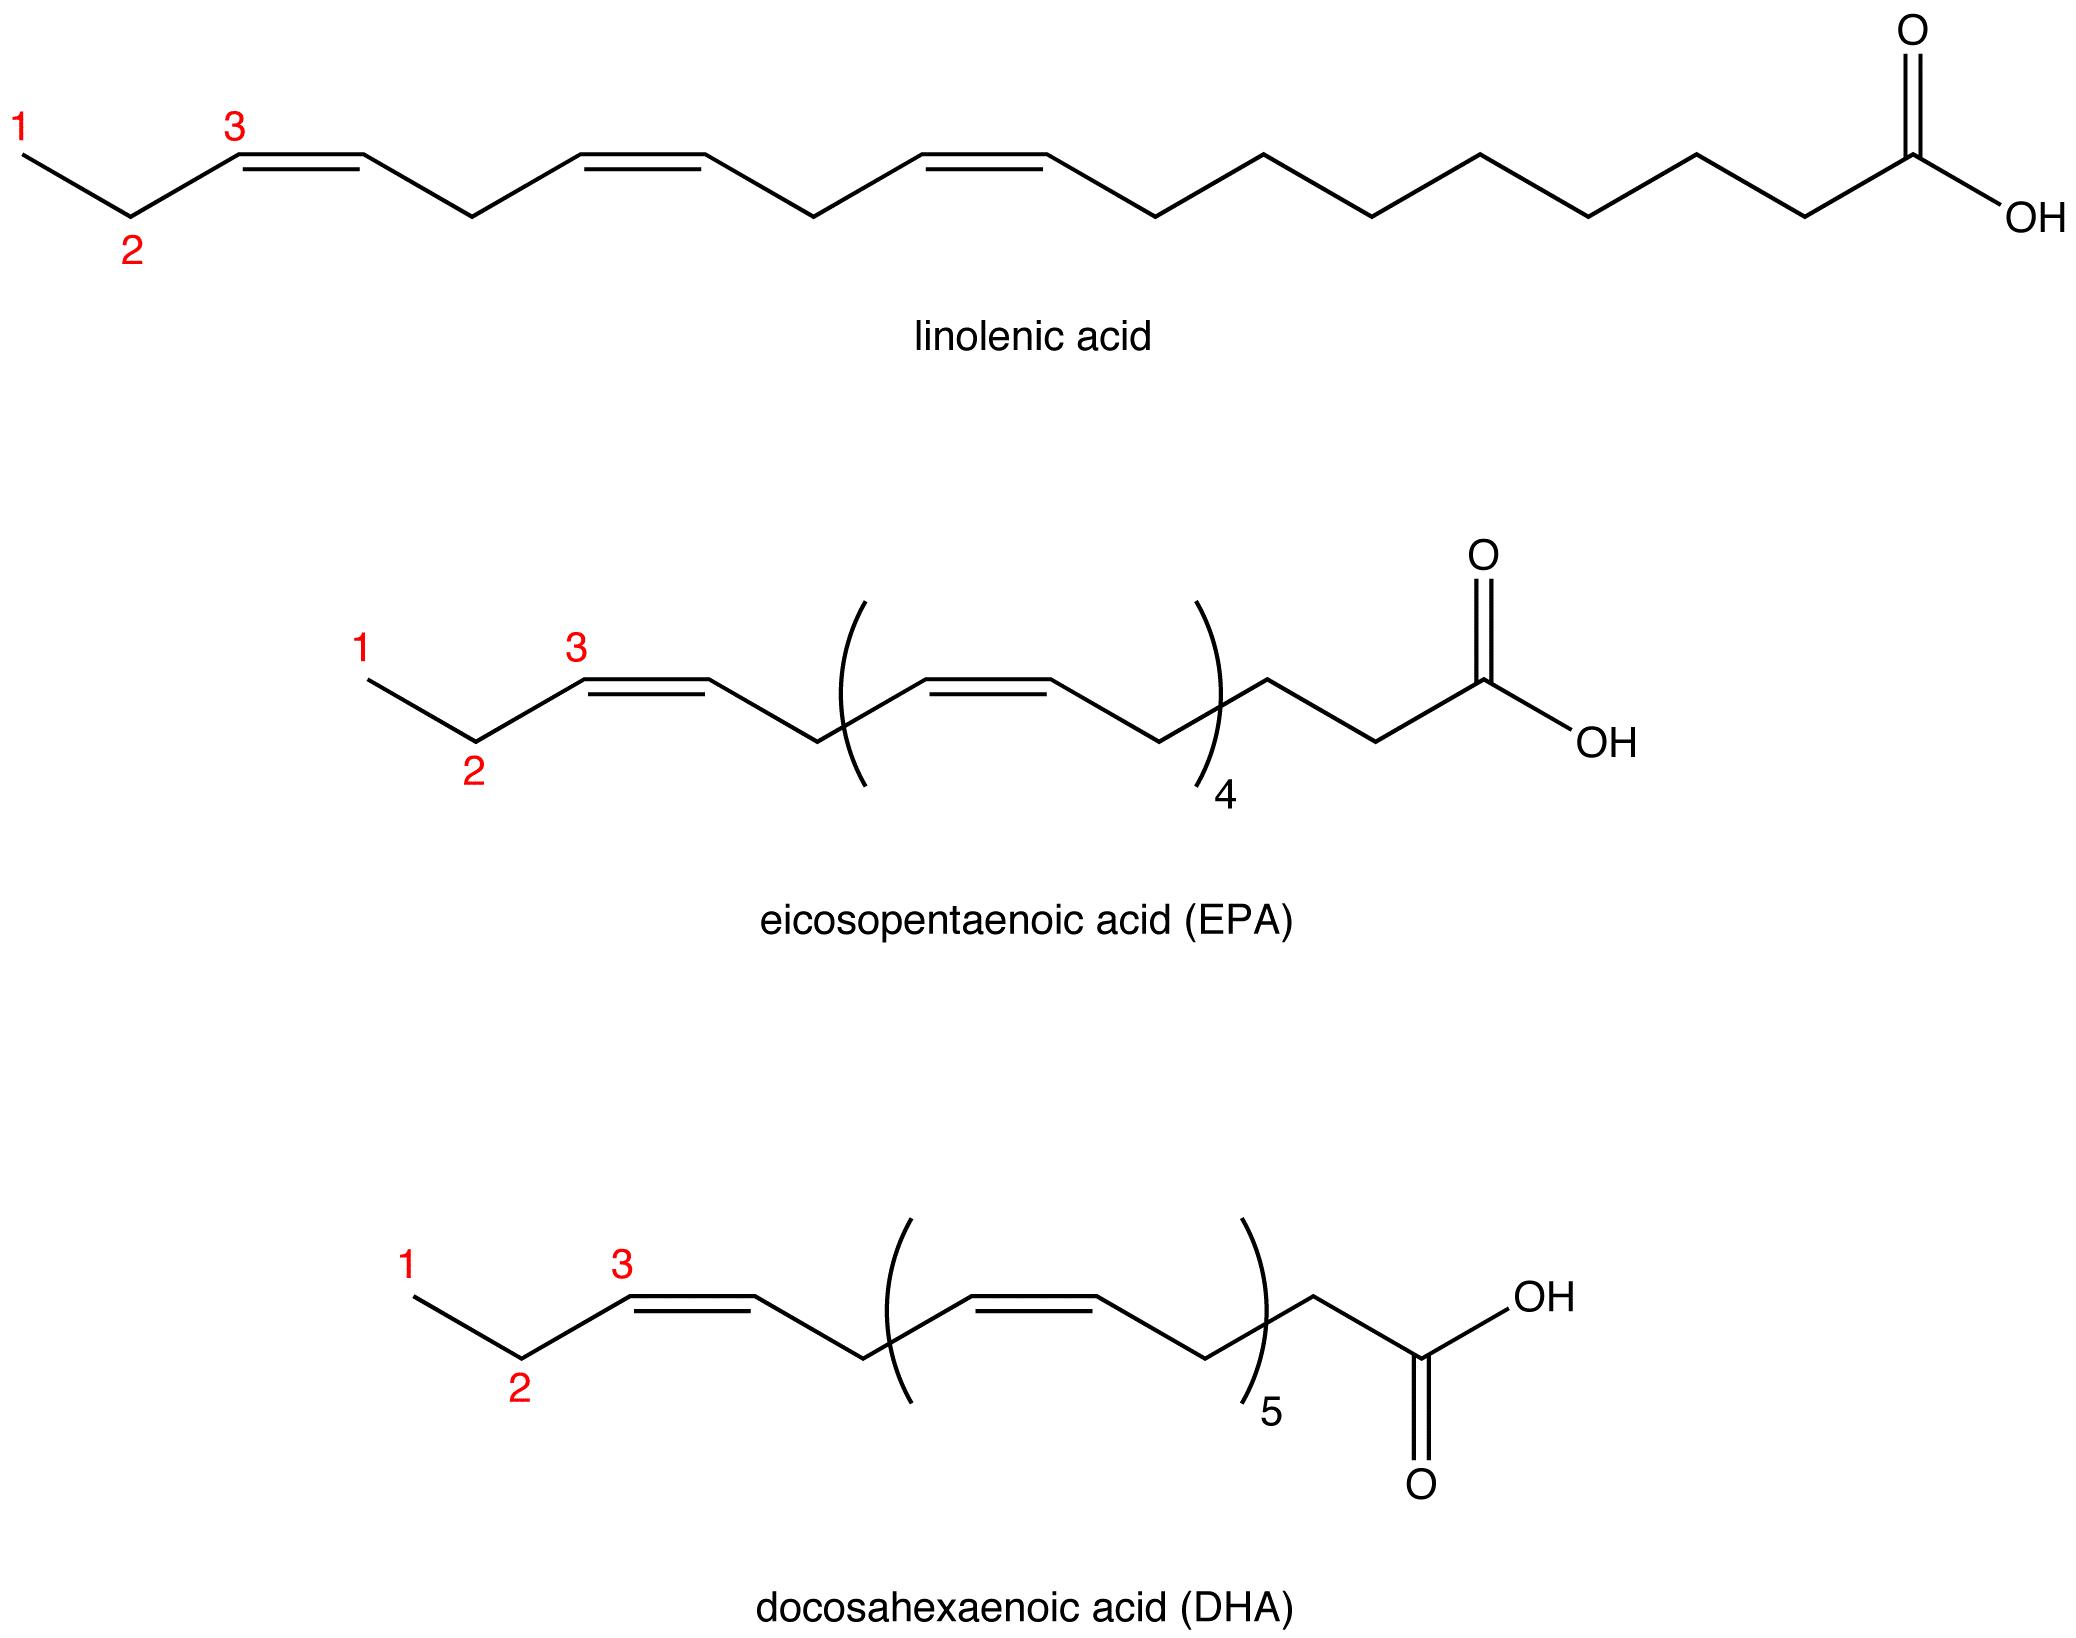 omega3 fatty acid ochempal